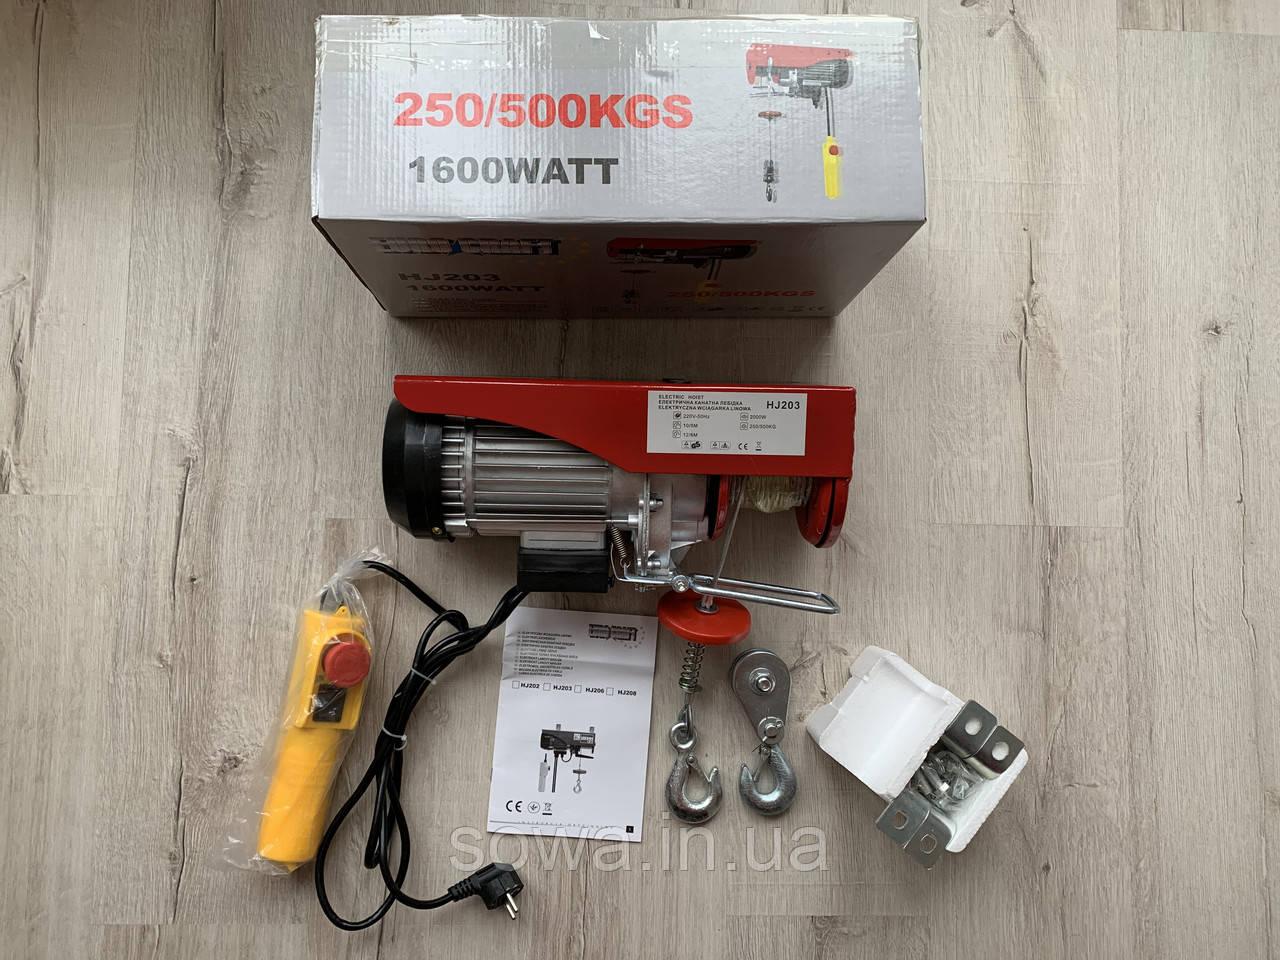 ✔️ Тельфер Euro Craft HJ203 - 250/500kg